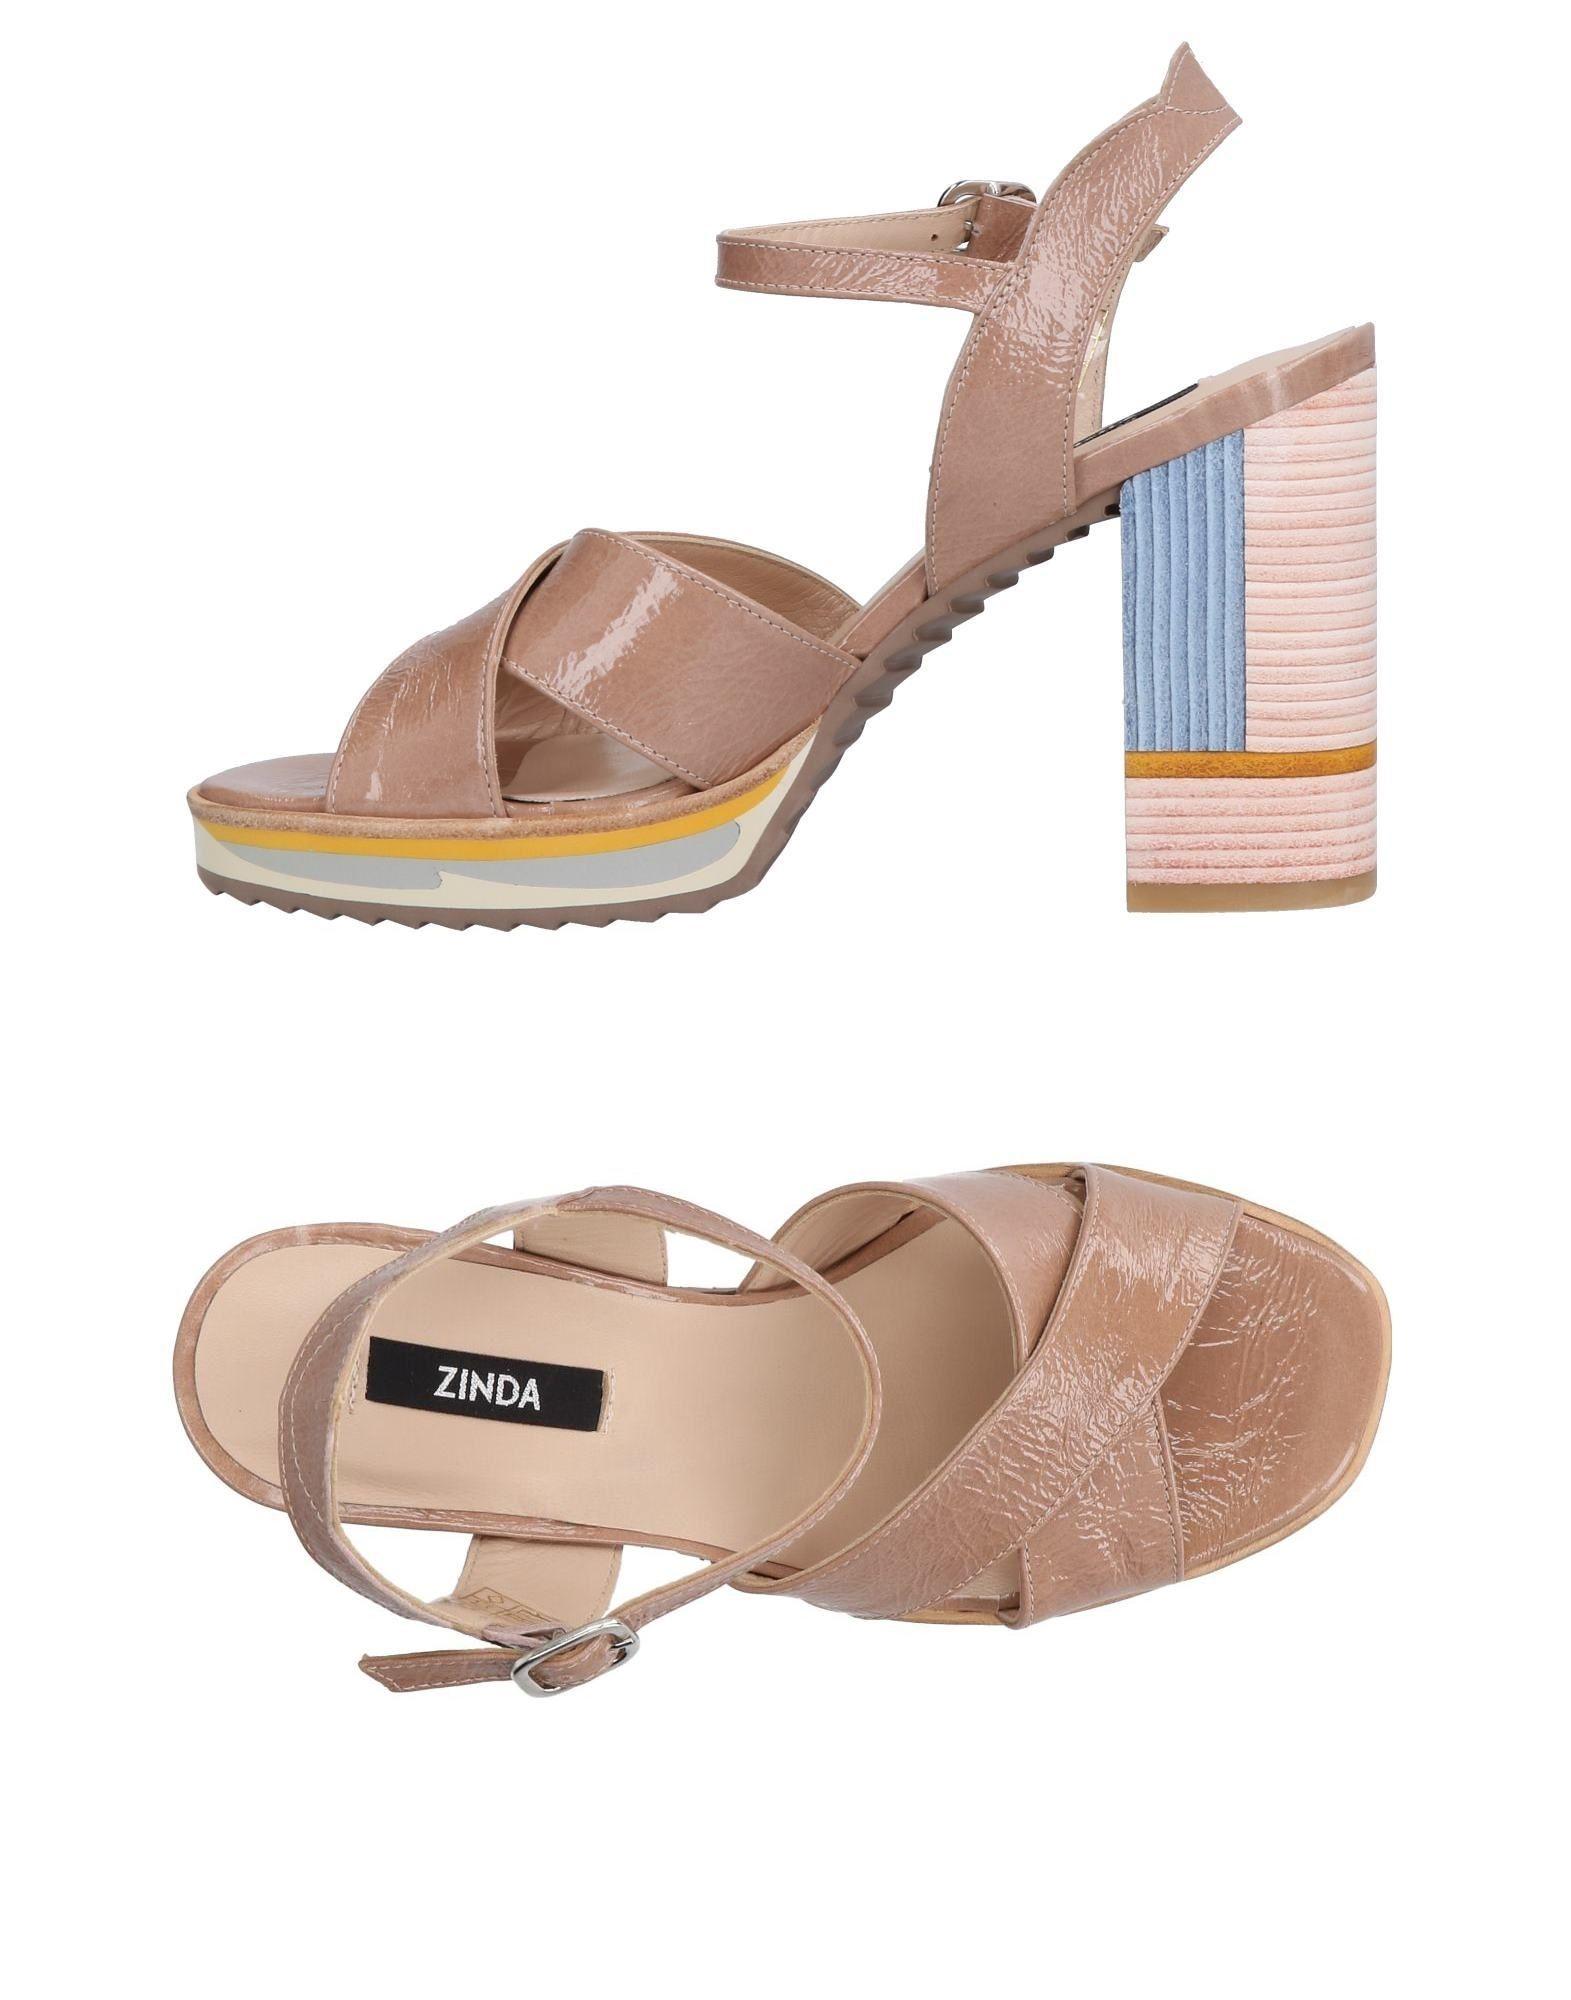 Zinda Sandalen Damen  11471761QE Gute Qualität beliebte Schuhe